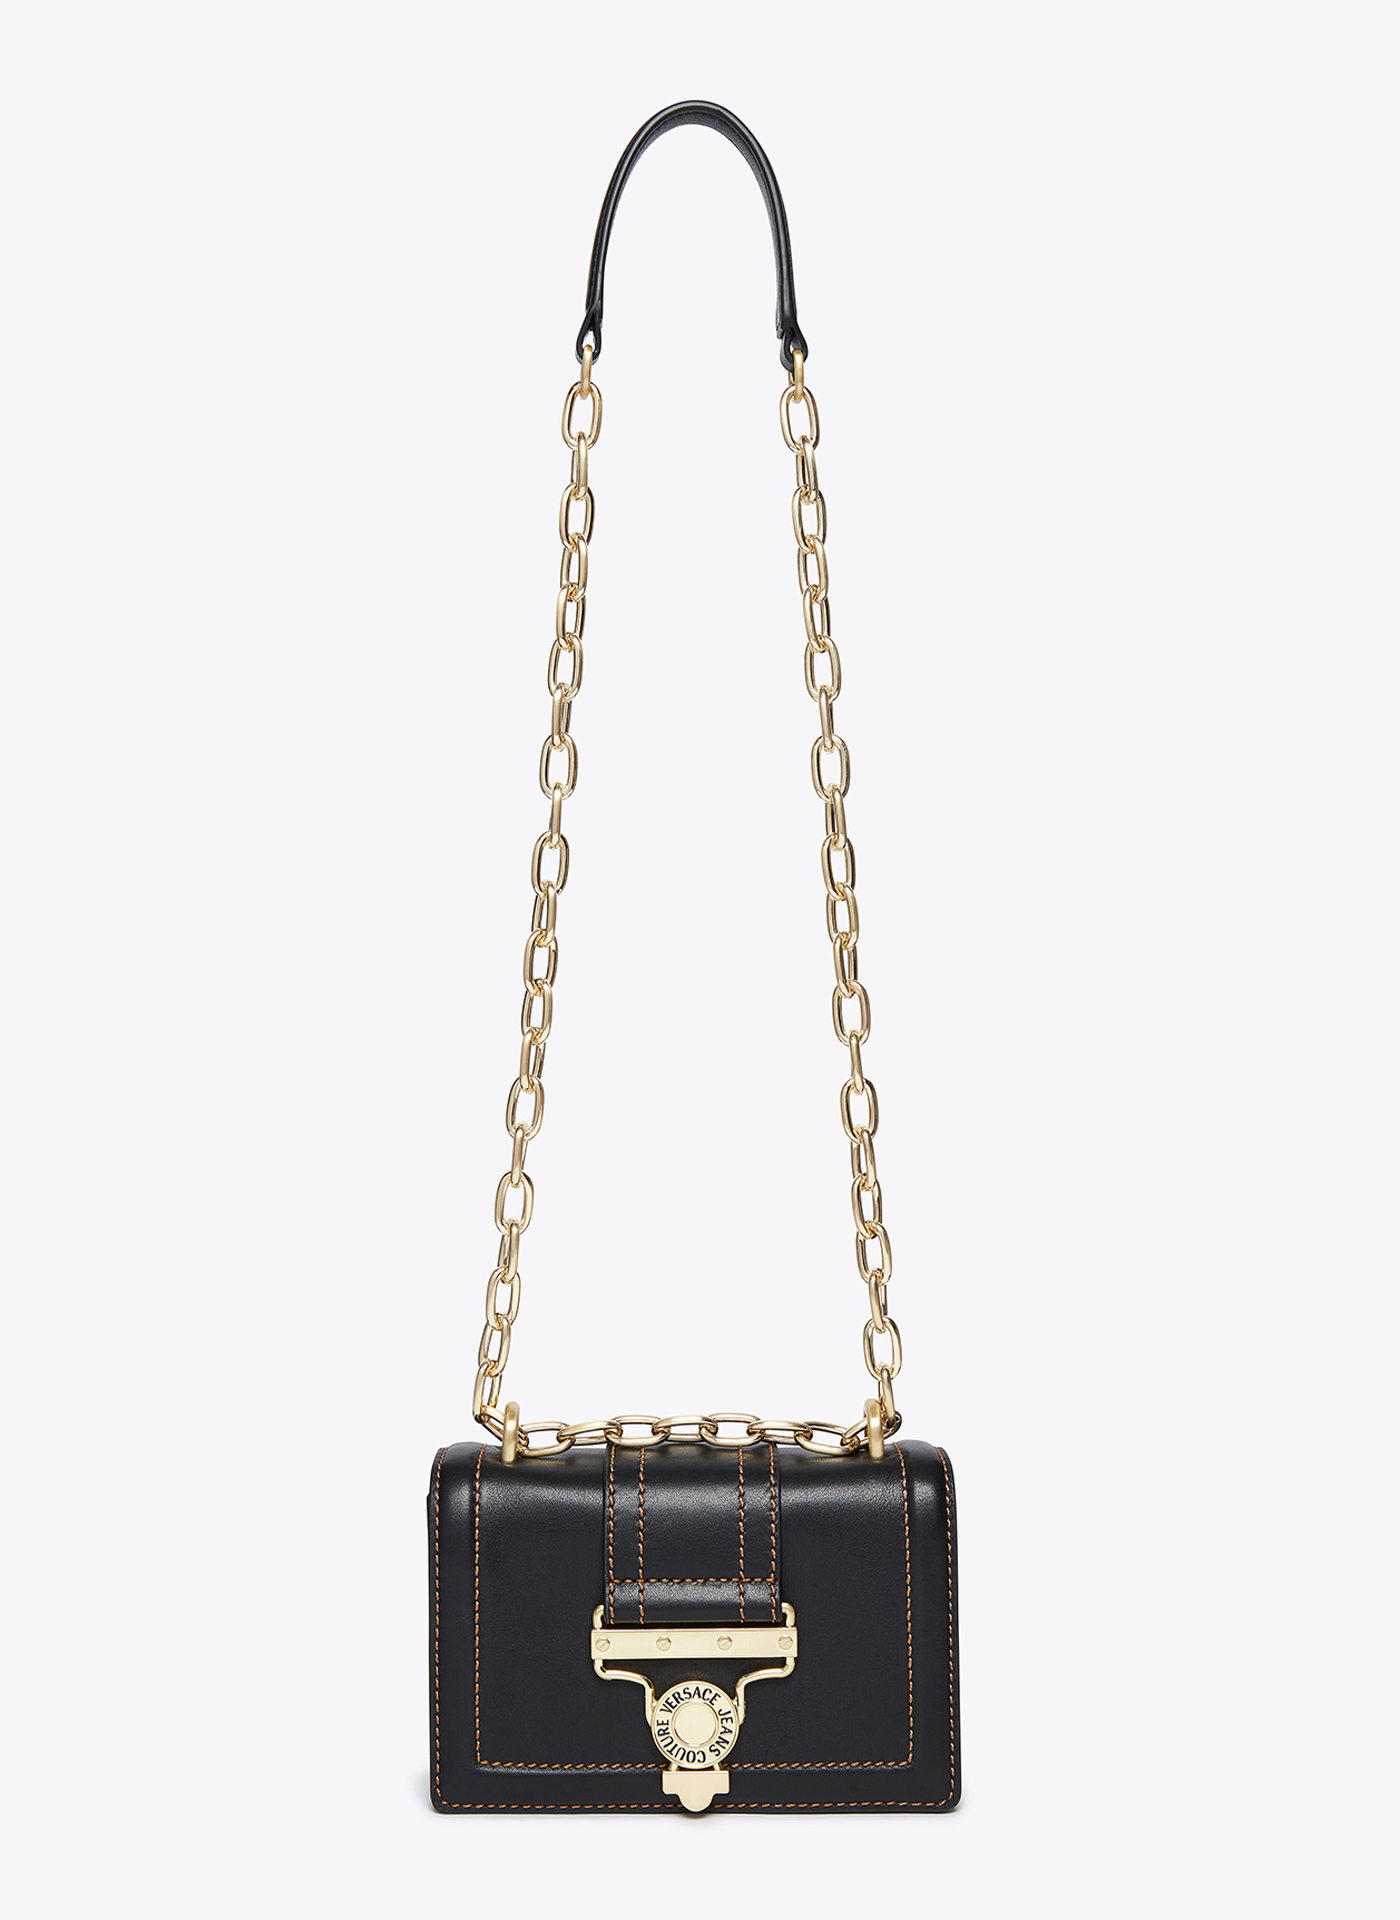 black and gold versace handbag